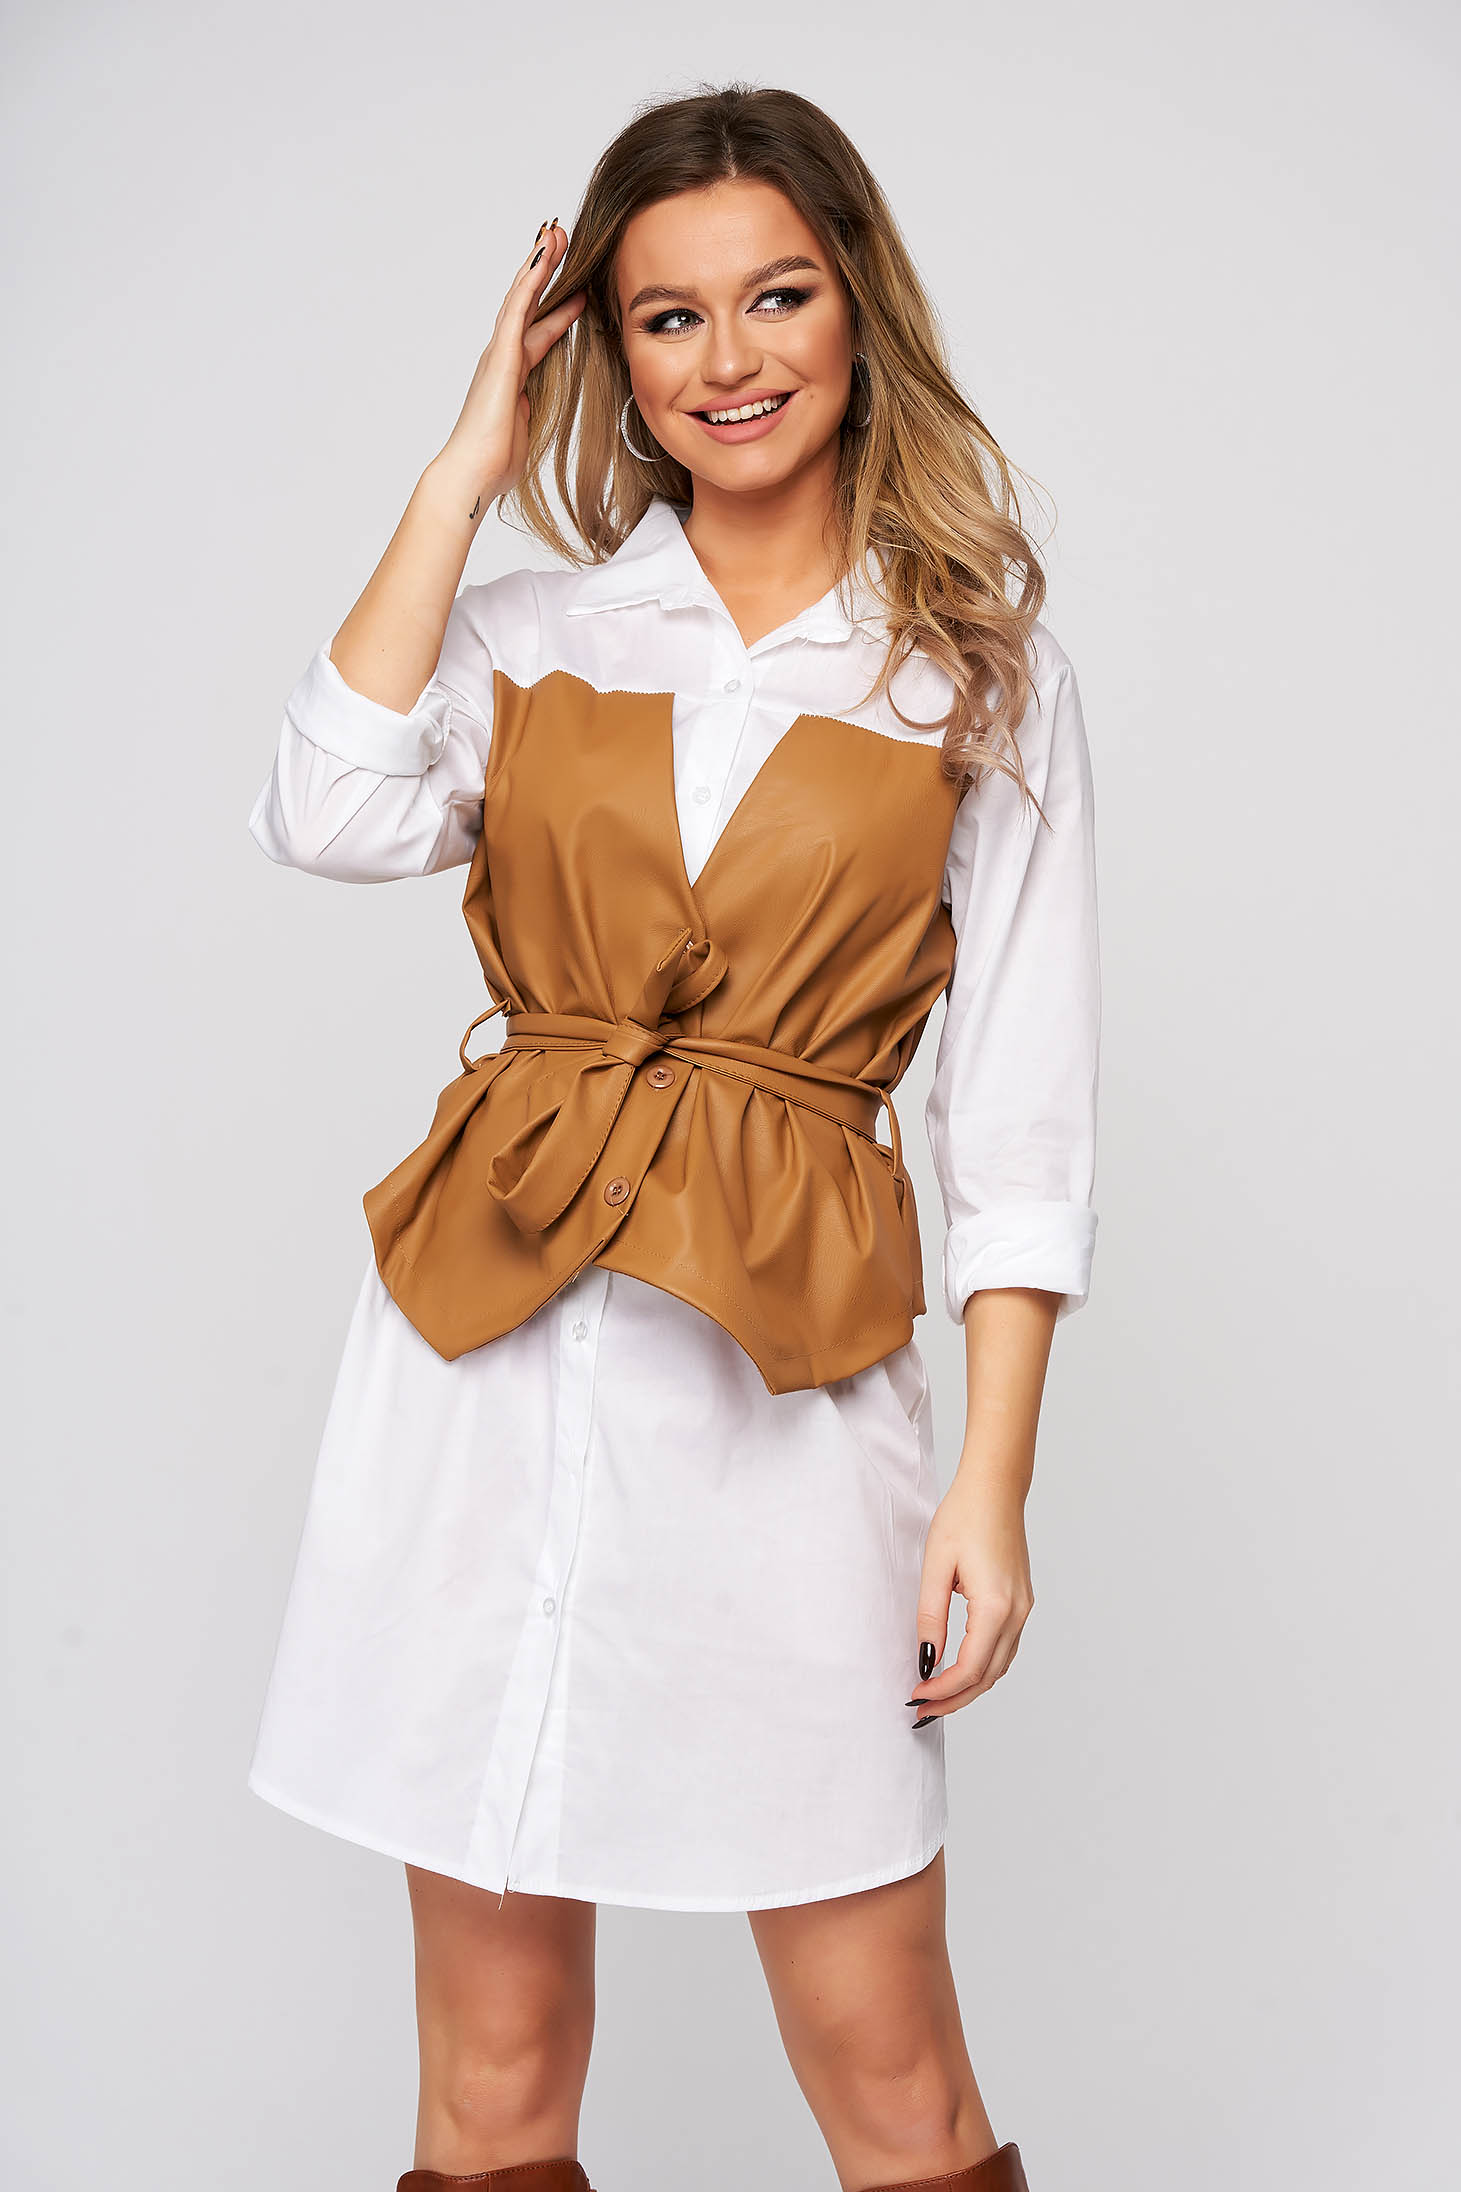 Rochie tip camasa SunShine alba accesorizata cu cordon cu aplicatii din piele ecologica